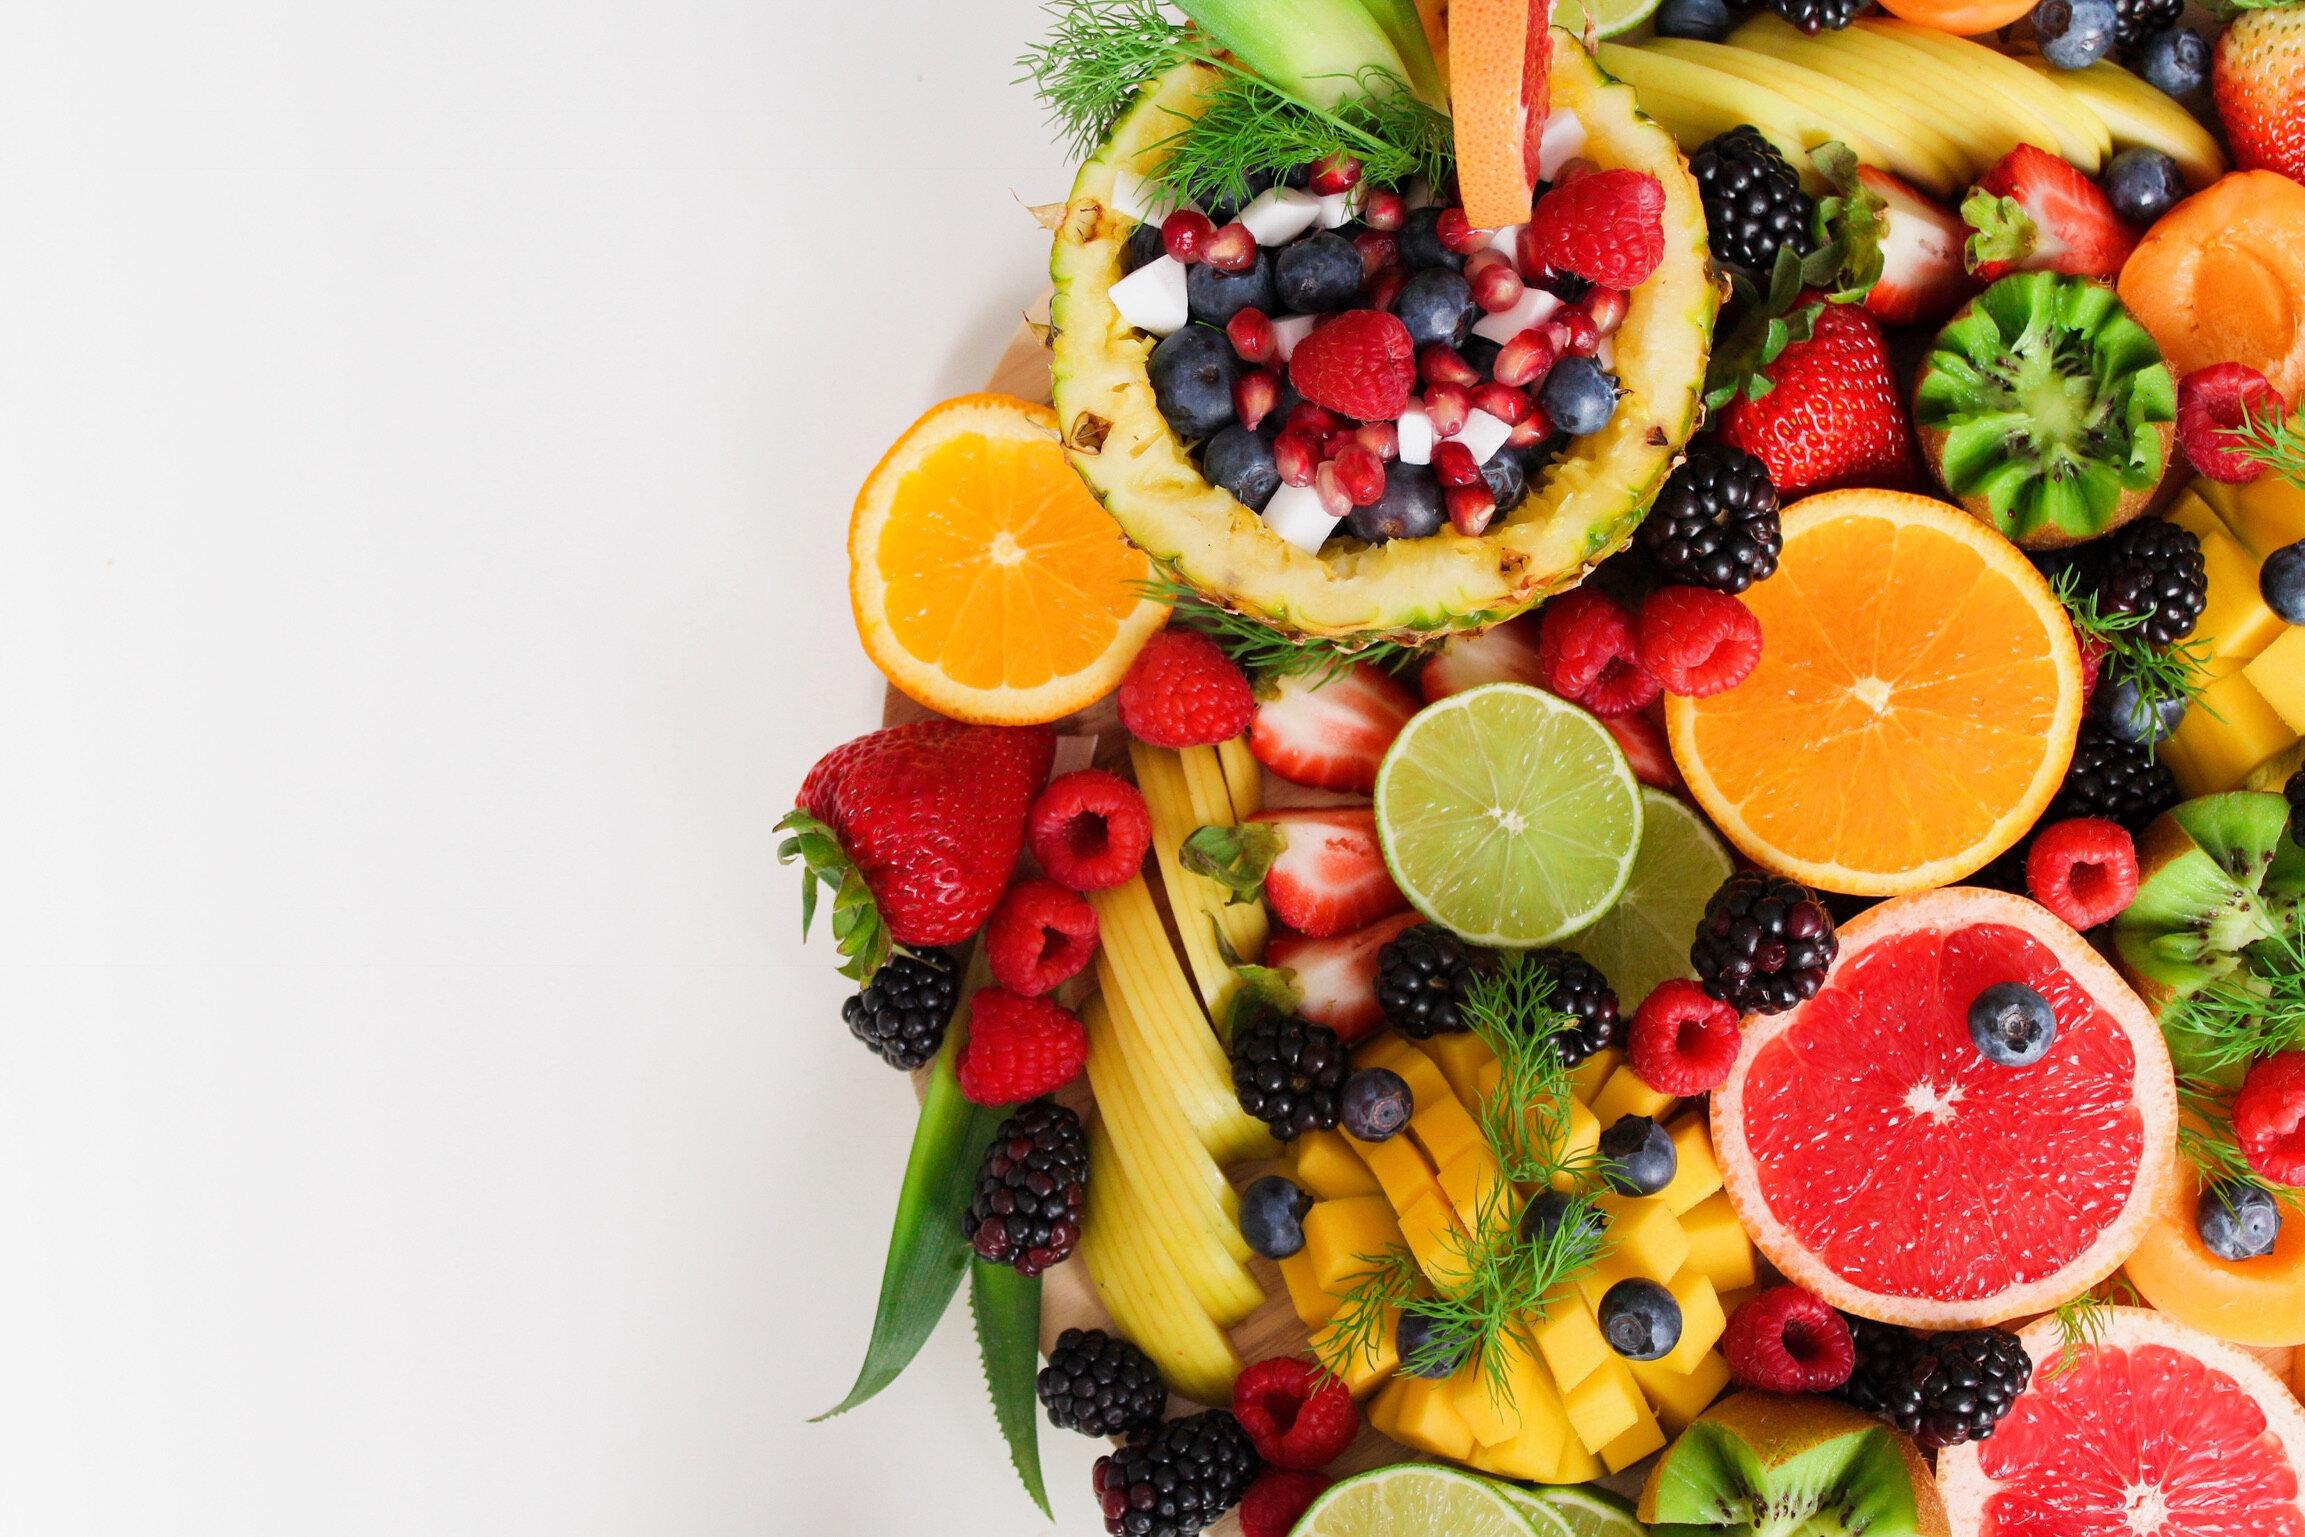 Canva - Assorted Sliced Fruits.jpg